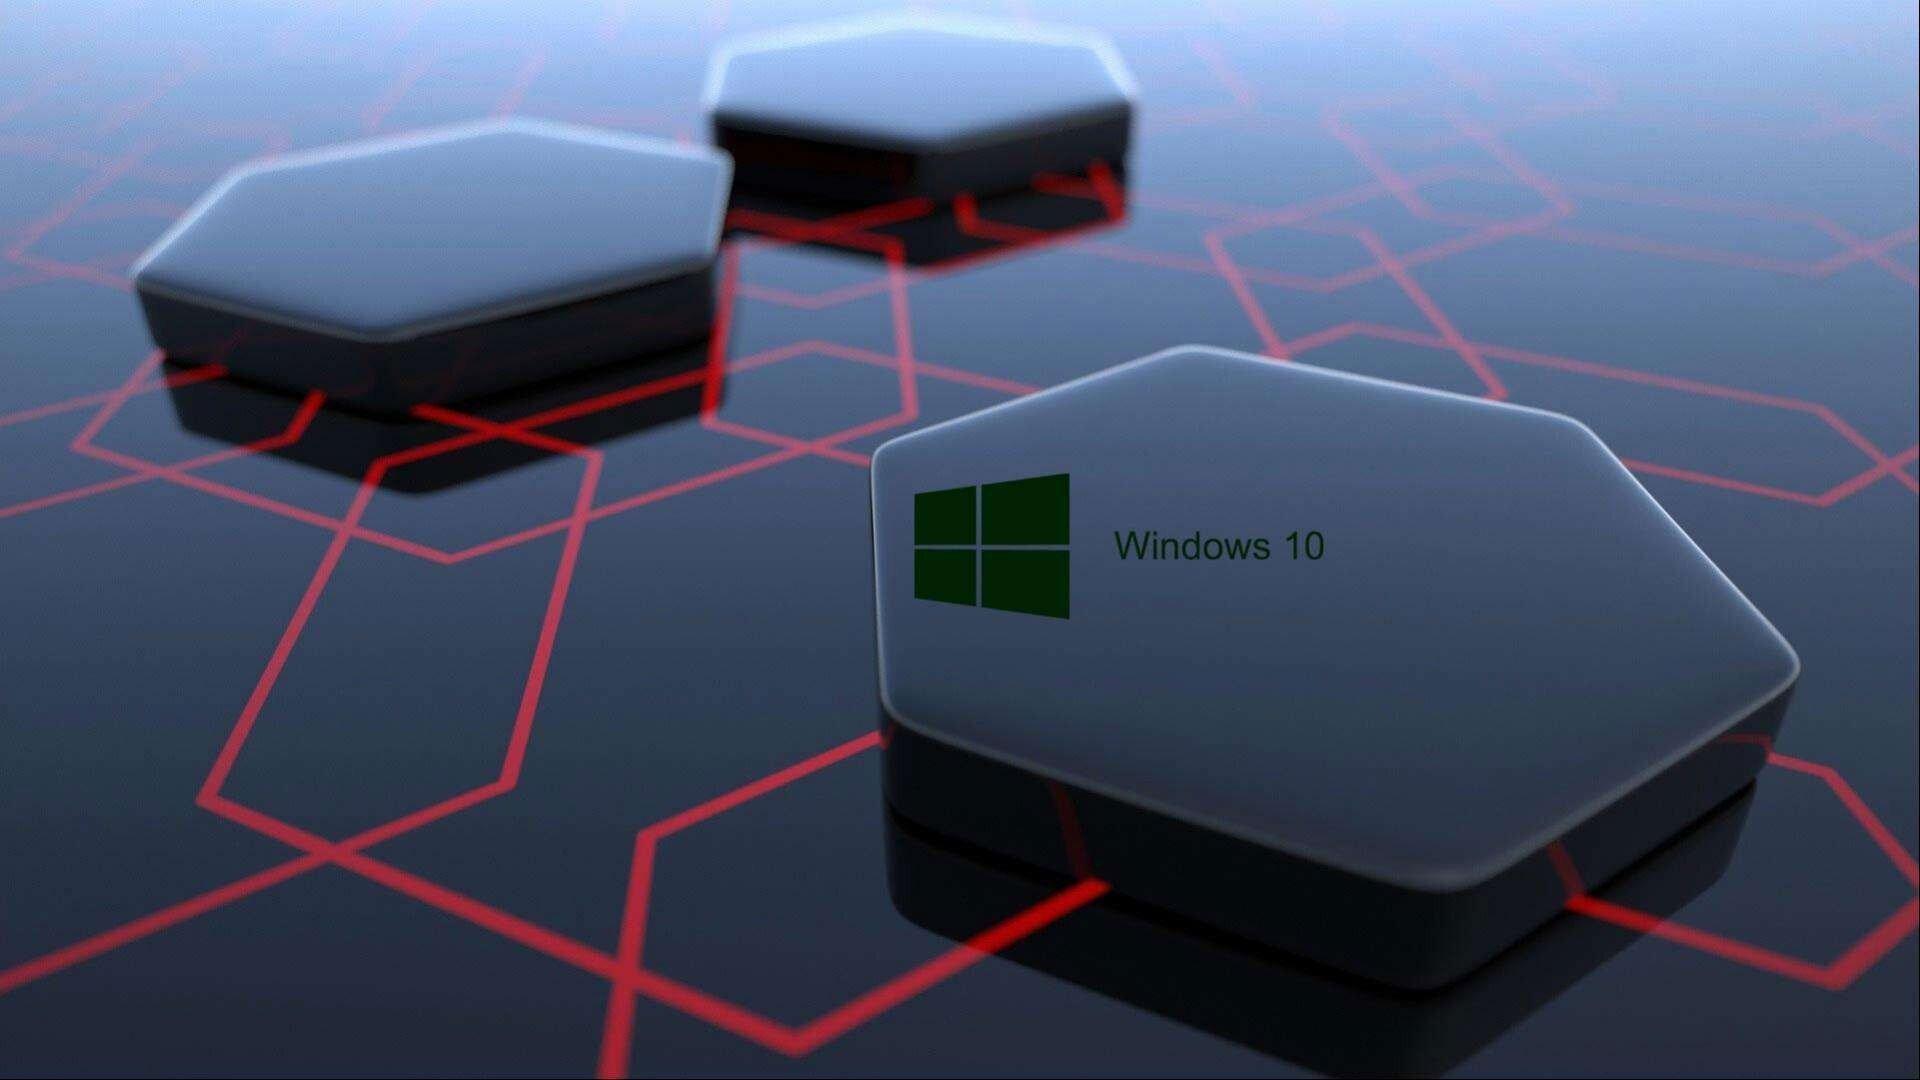 Windowsfront